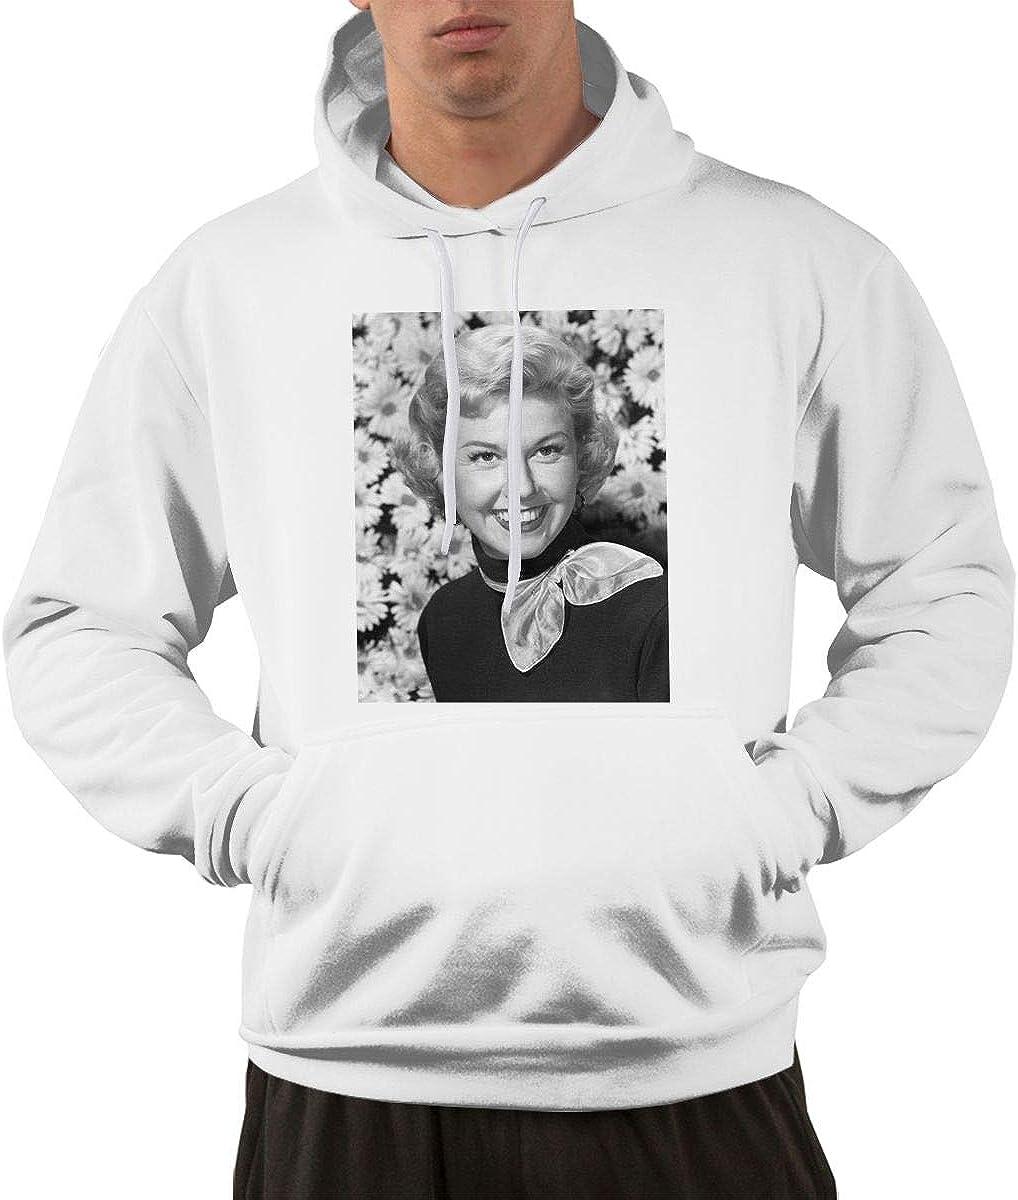 JEEZORN Fashion Doris Day Hoodie Sweatshirt for Mens Black